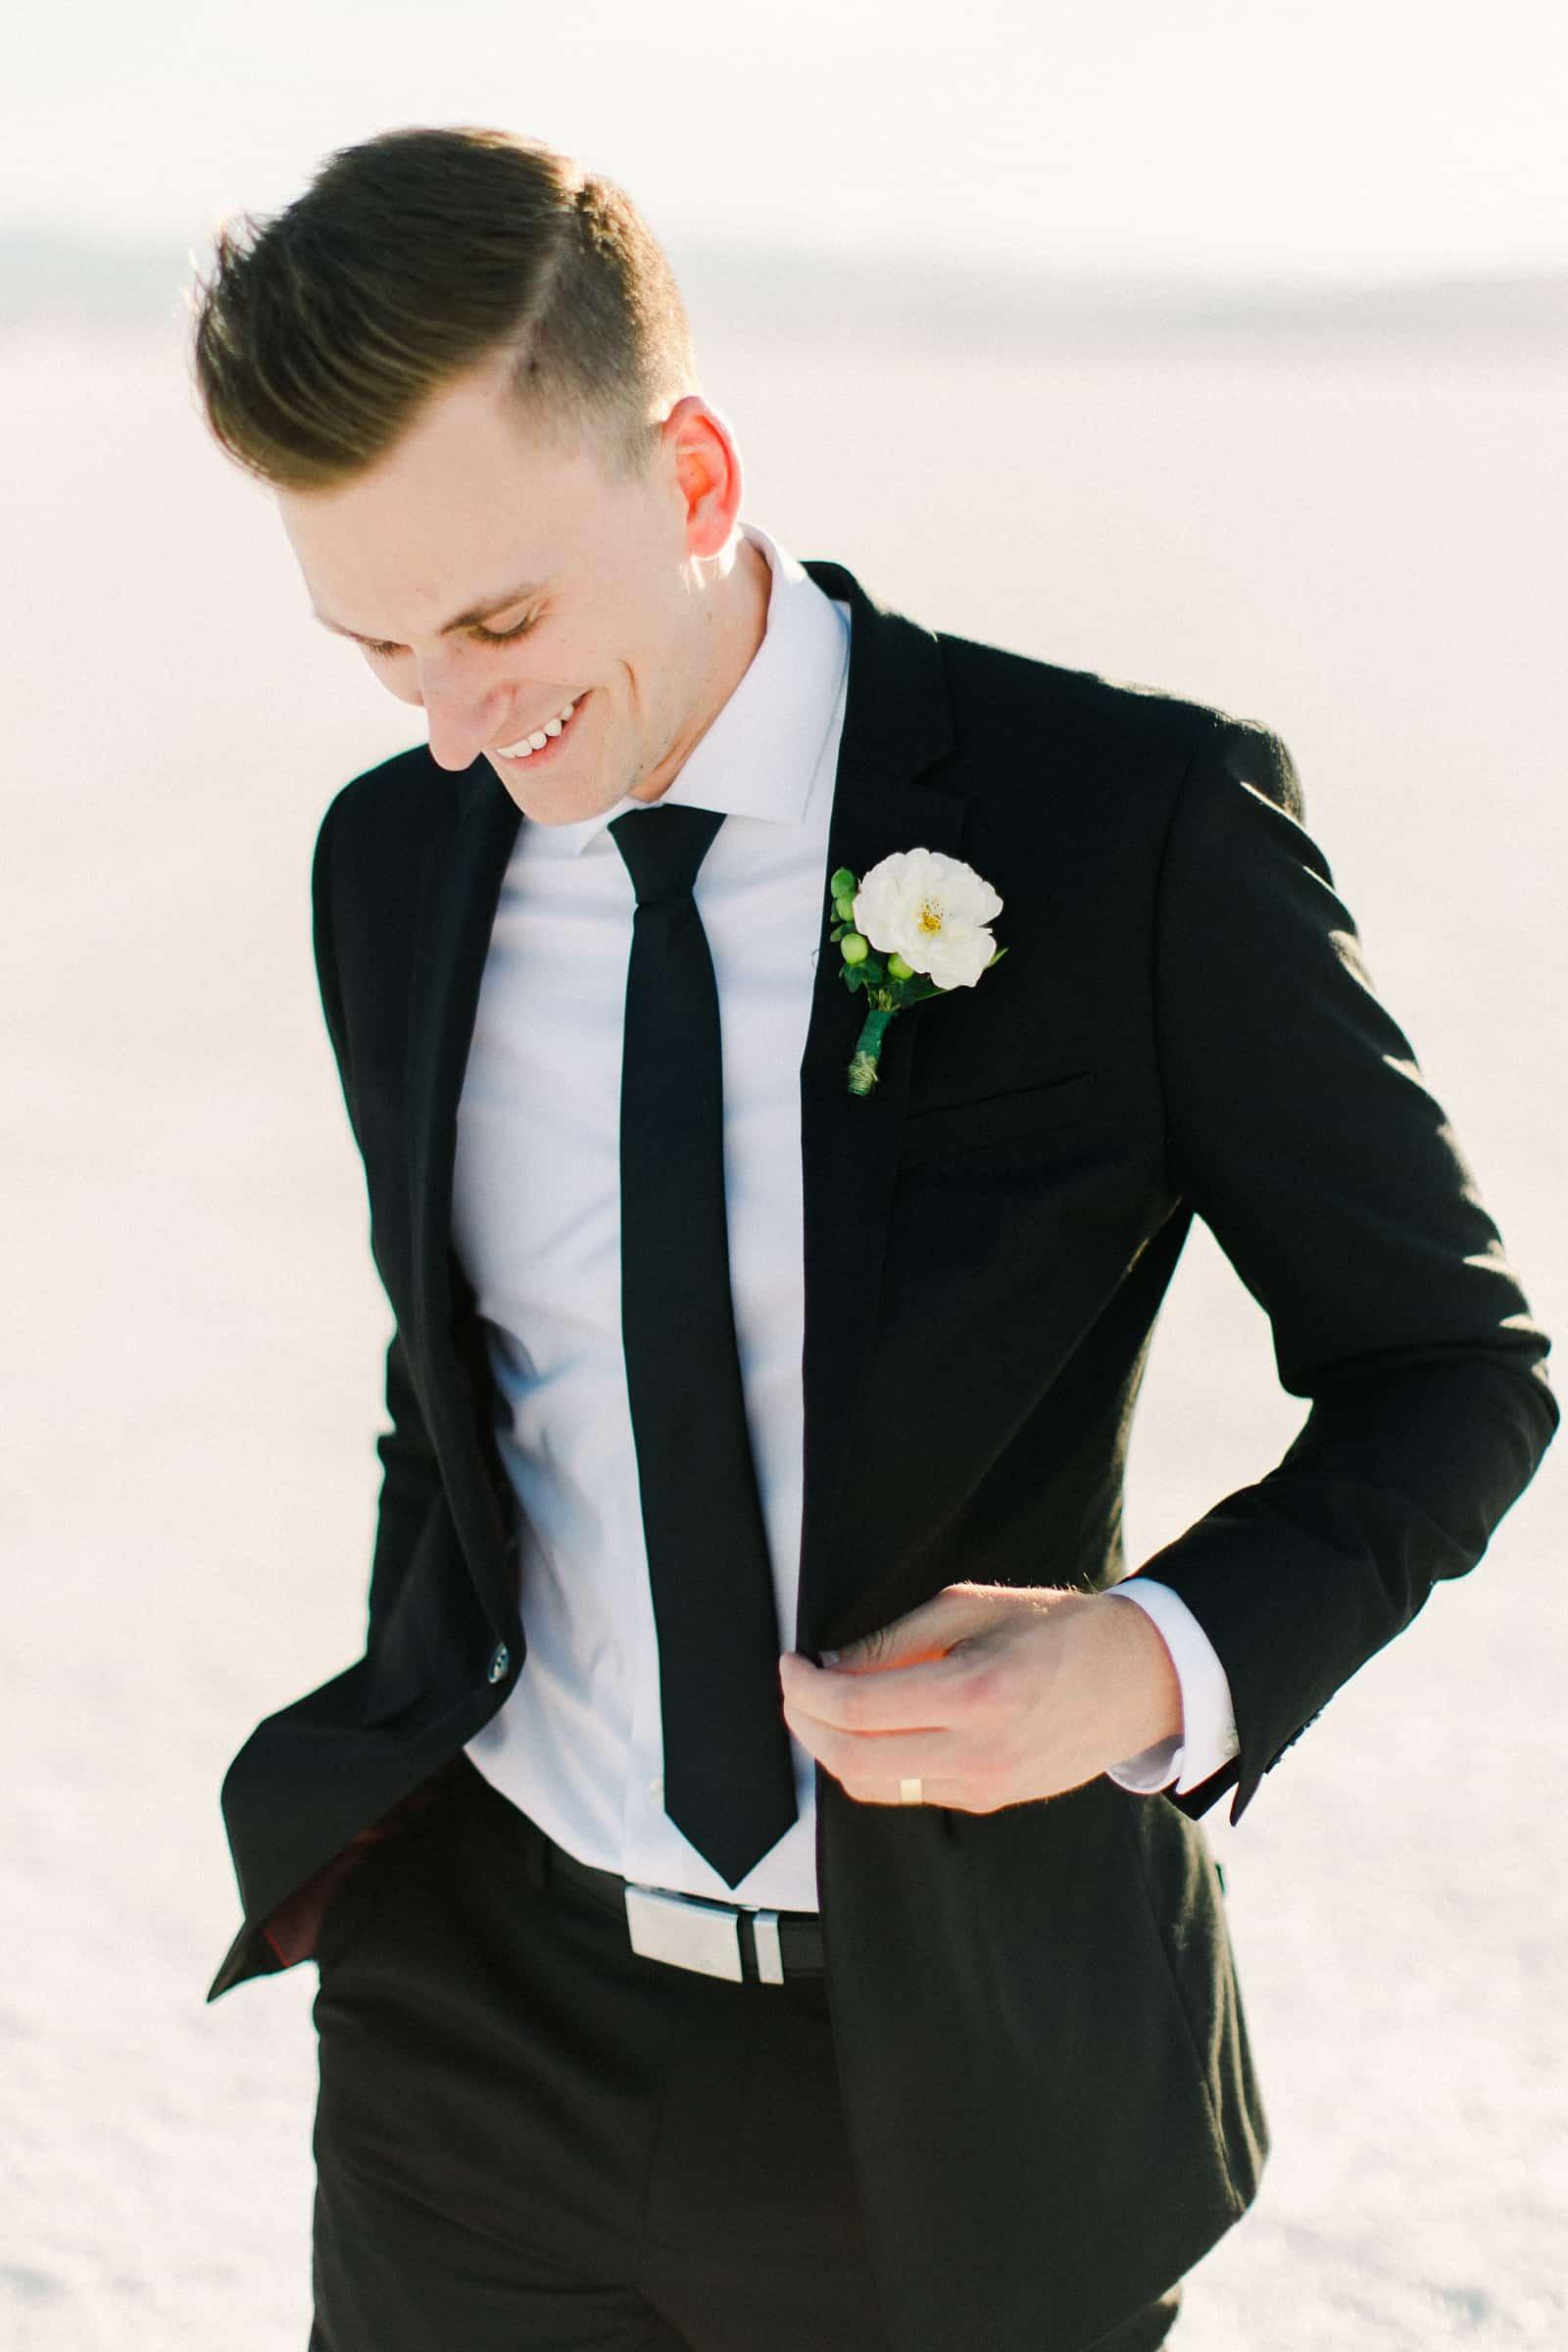 Bonneville Salt Flats Utah Wedding Photography, destination wedding, groom smiling in classic black suit and black tie